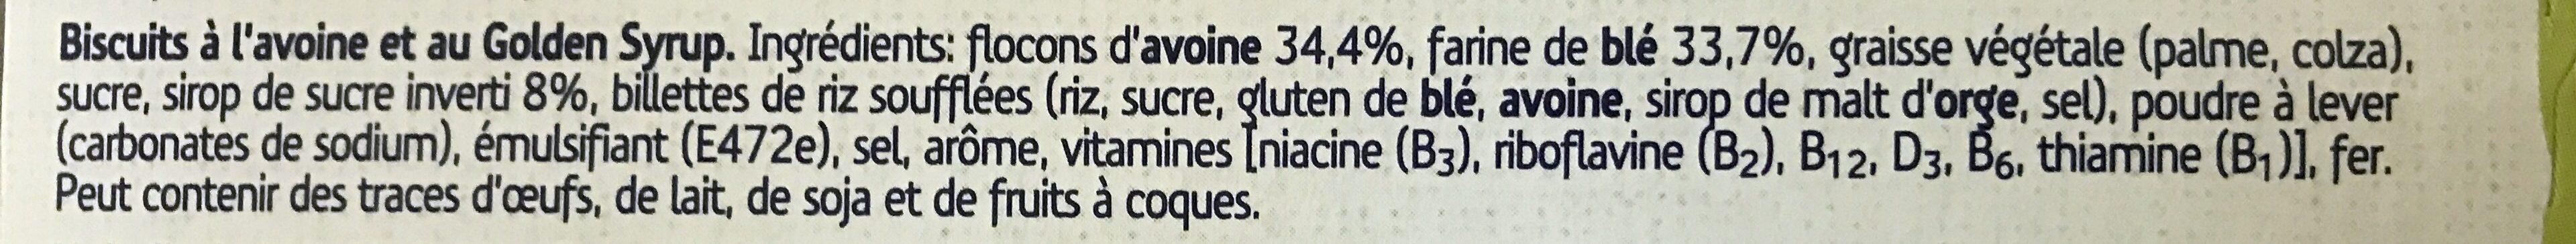 Sultana Goodmorning Golden Syrup - Ingrediënten - fr